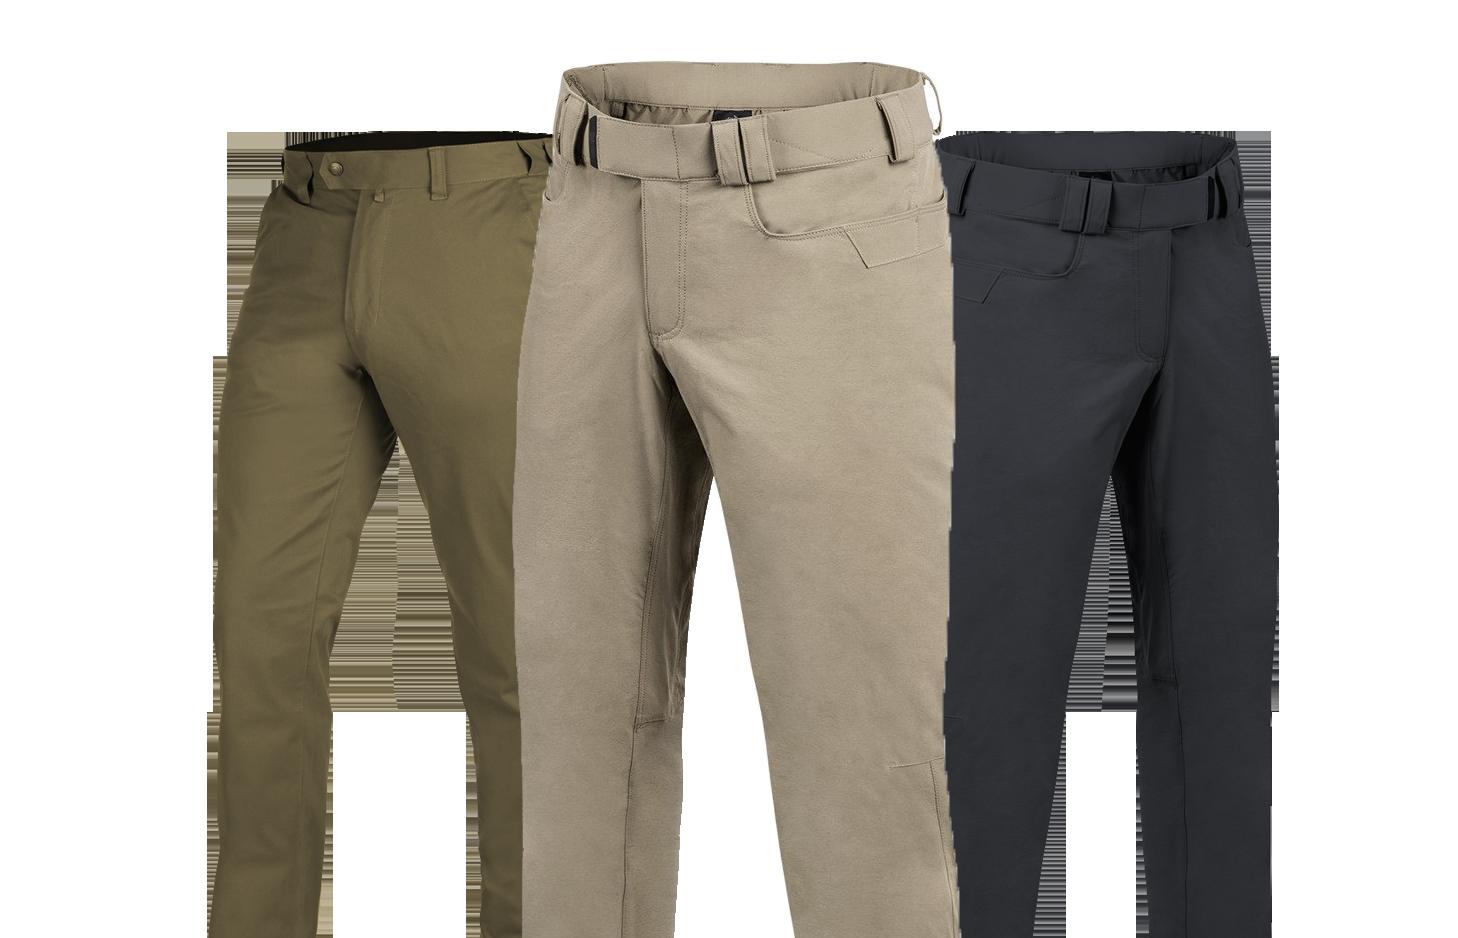 covert tactical pants at bereli